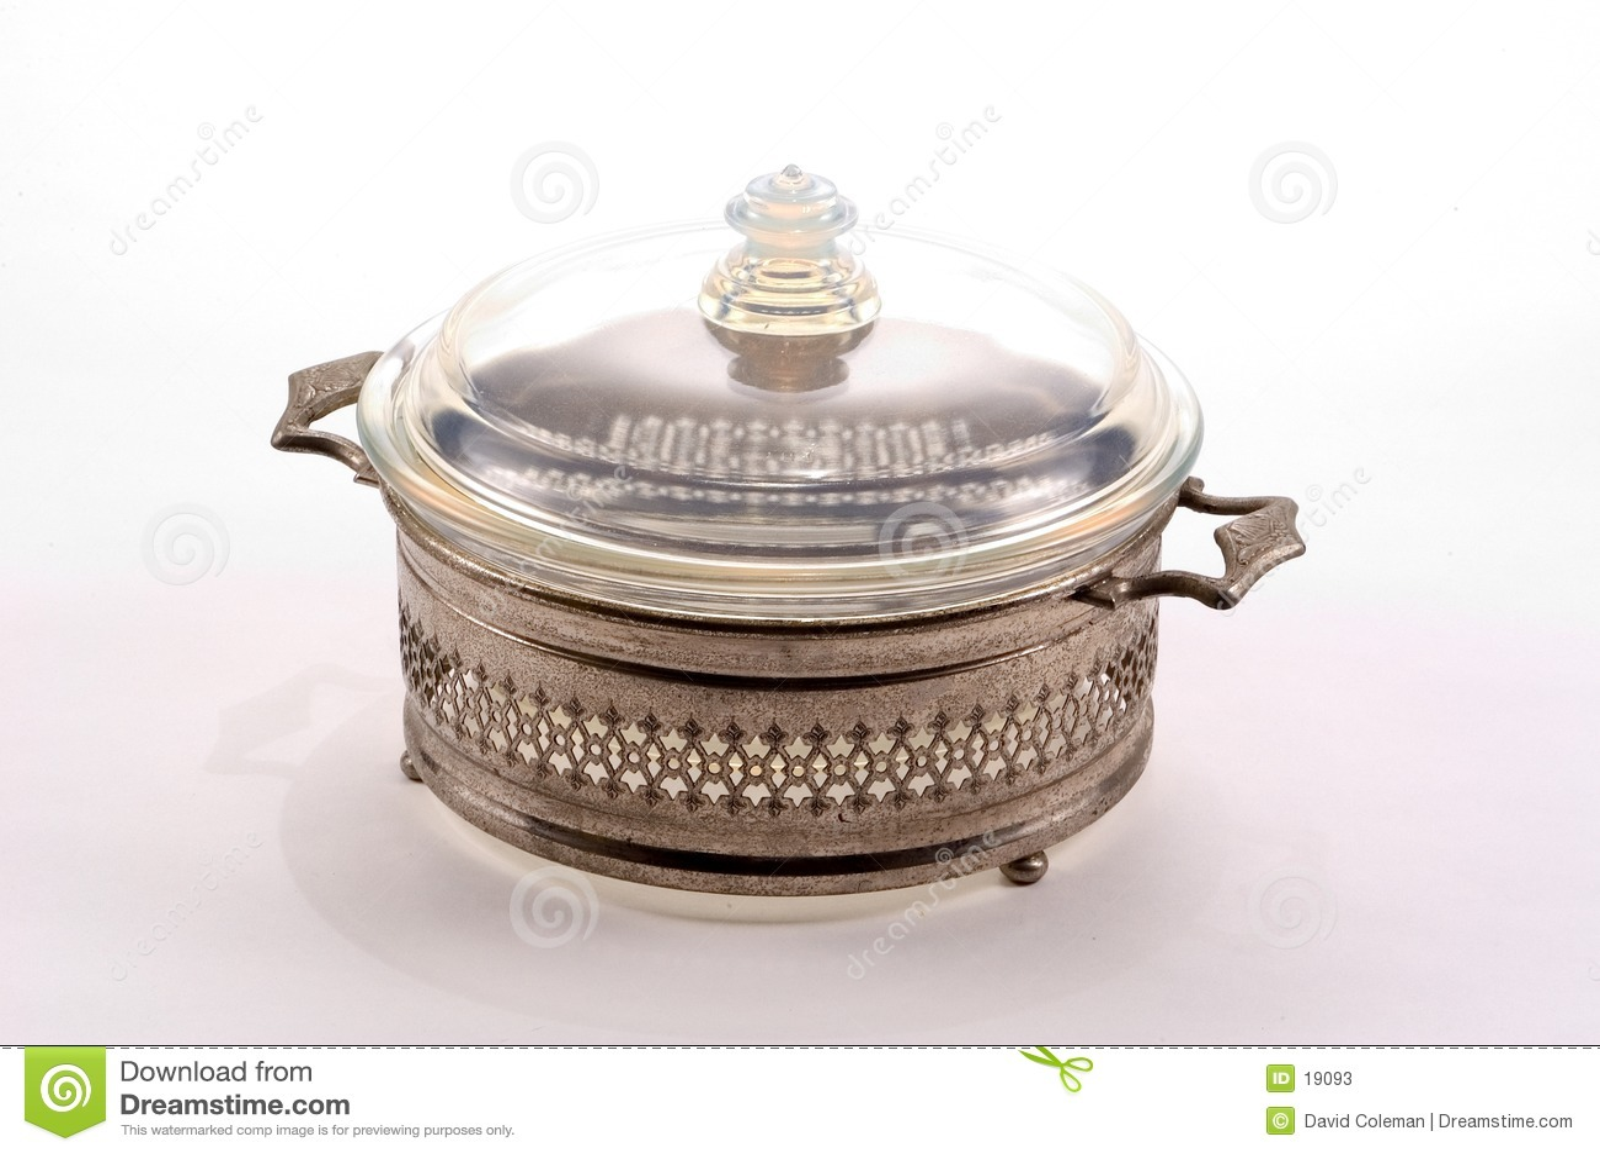 Serving Dish